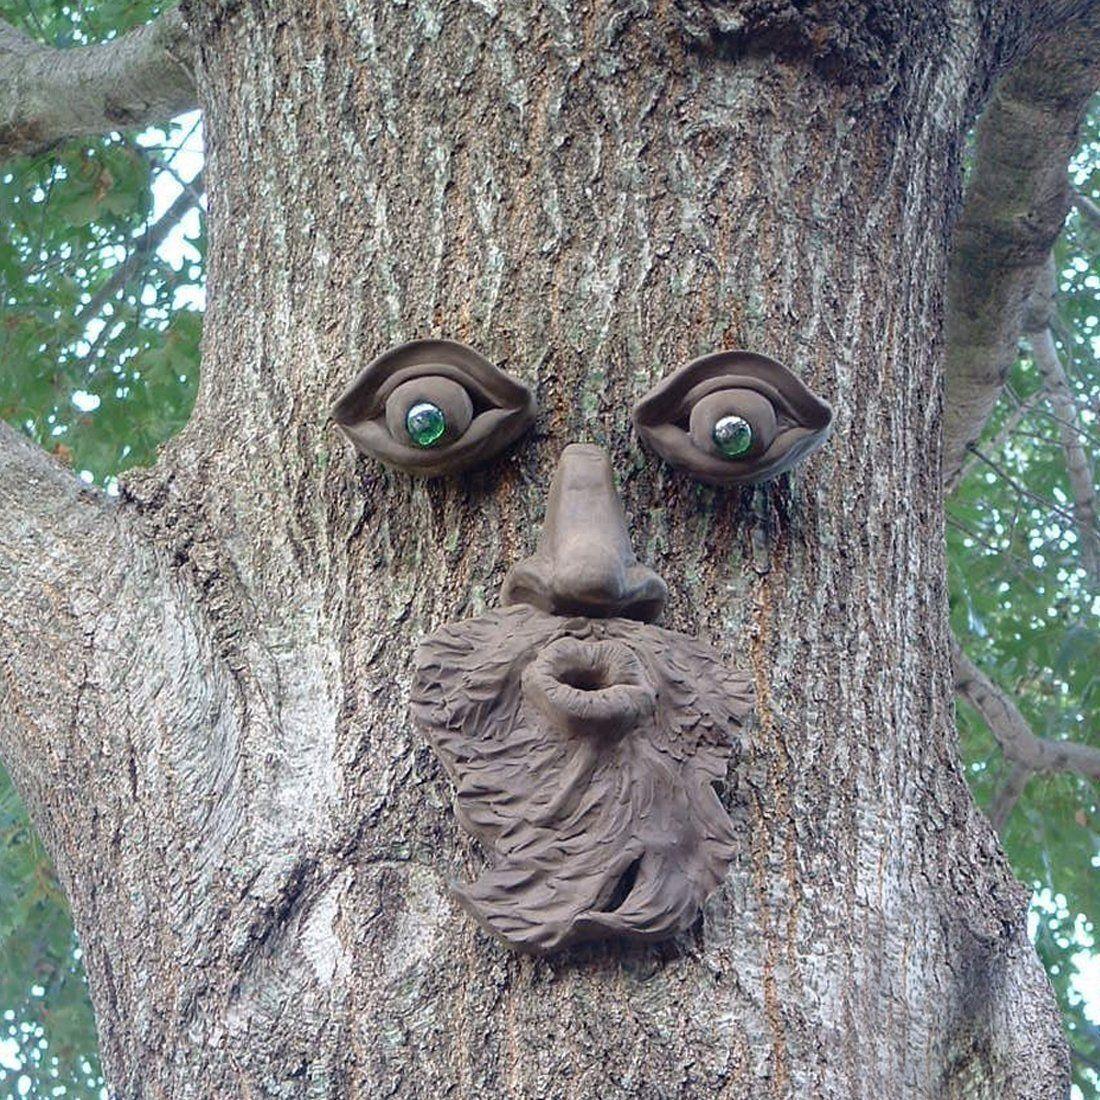 Funny Garden Tree Face Sculpture   Outdoor Yard Art Tree Tank Beard Green  Glass Eyes Face